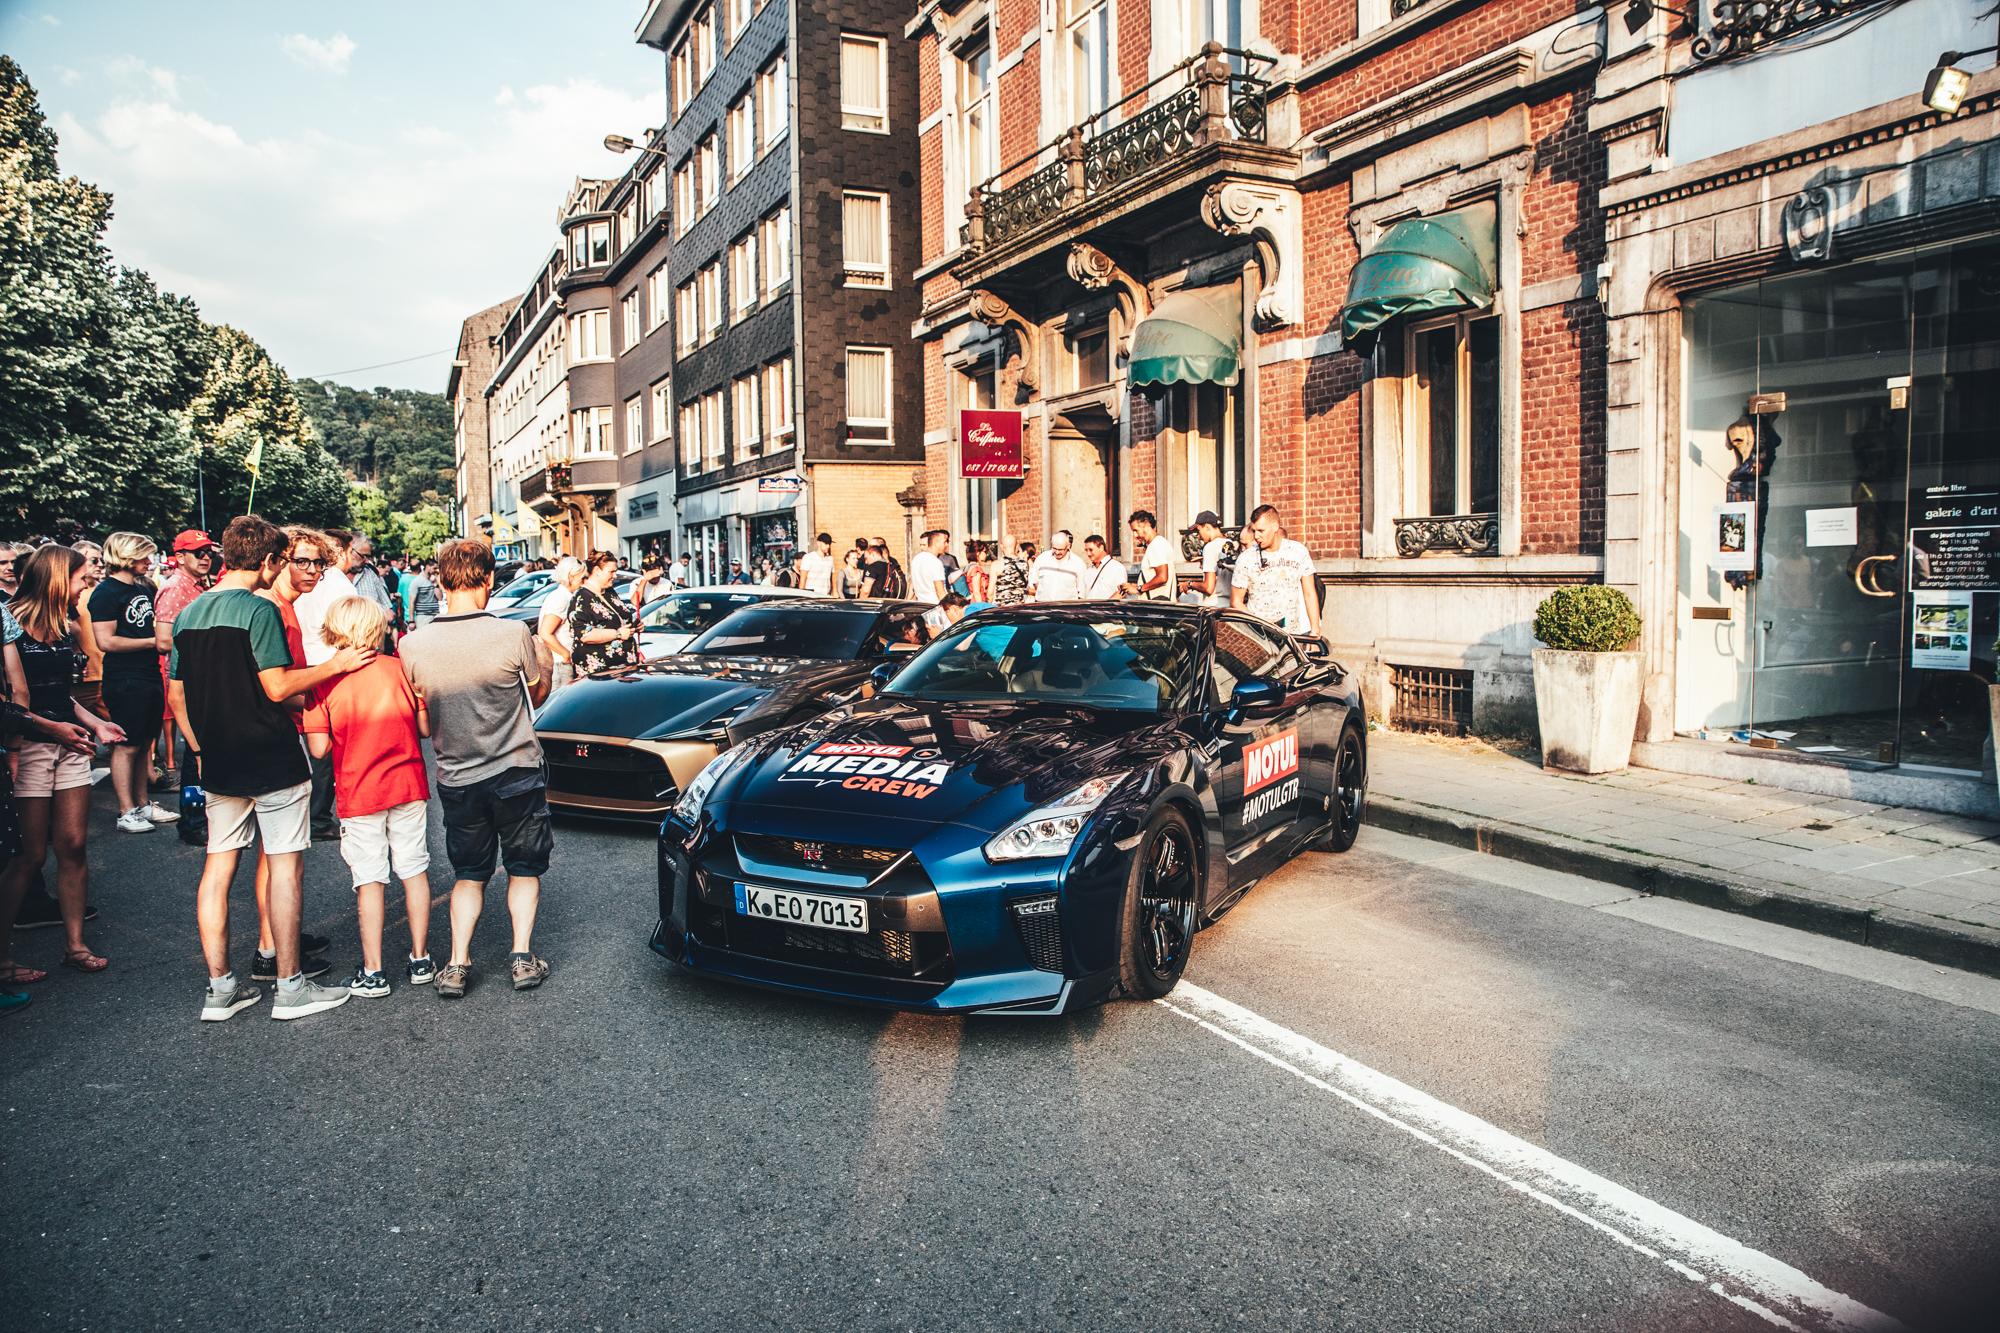 The #MotulGTR parades through Spa.